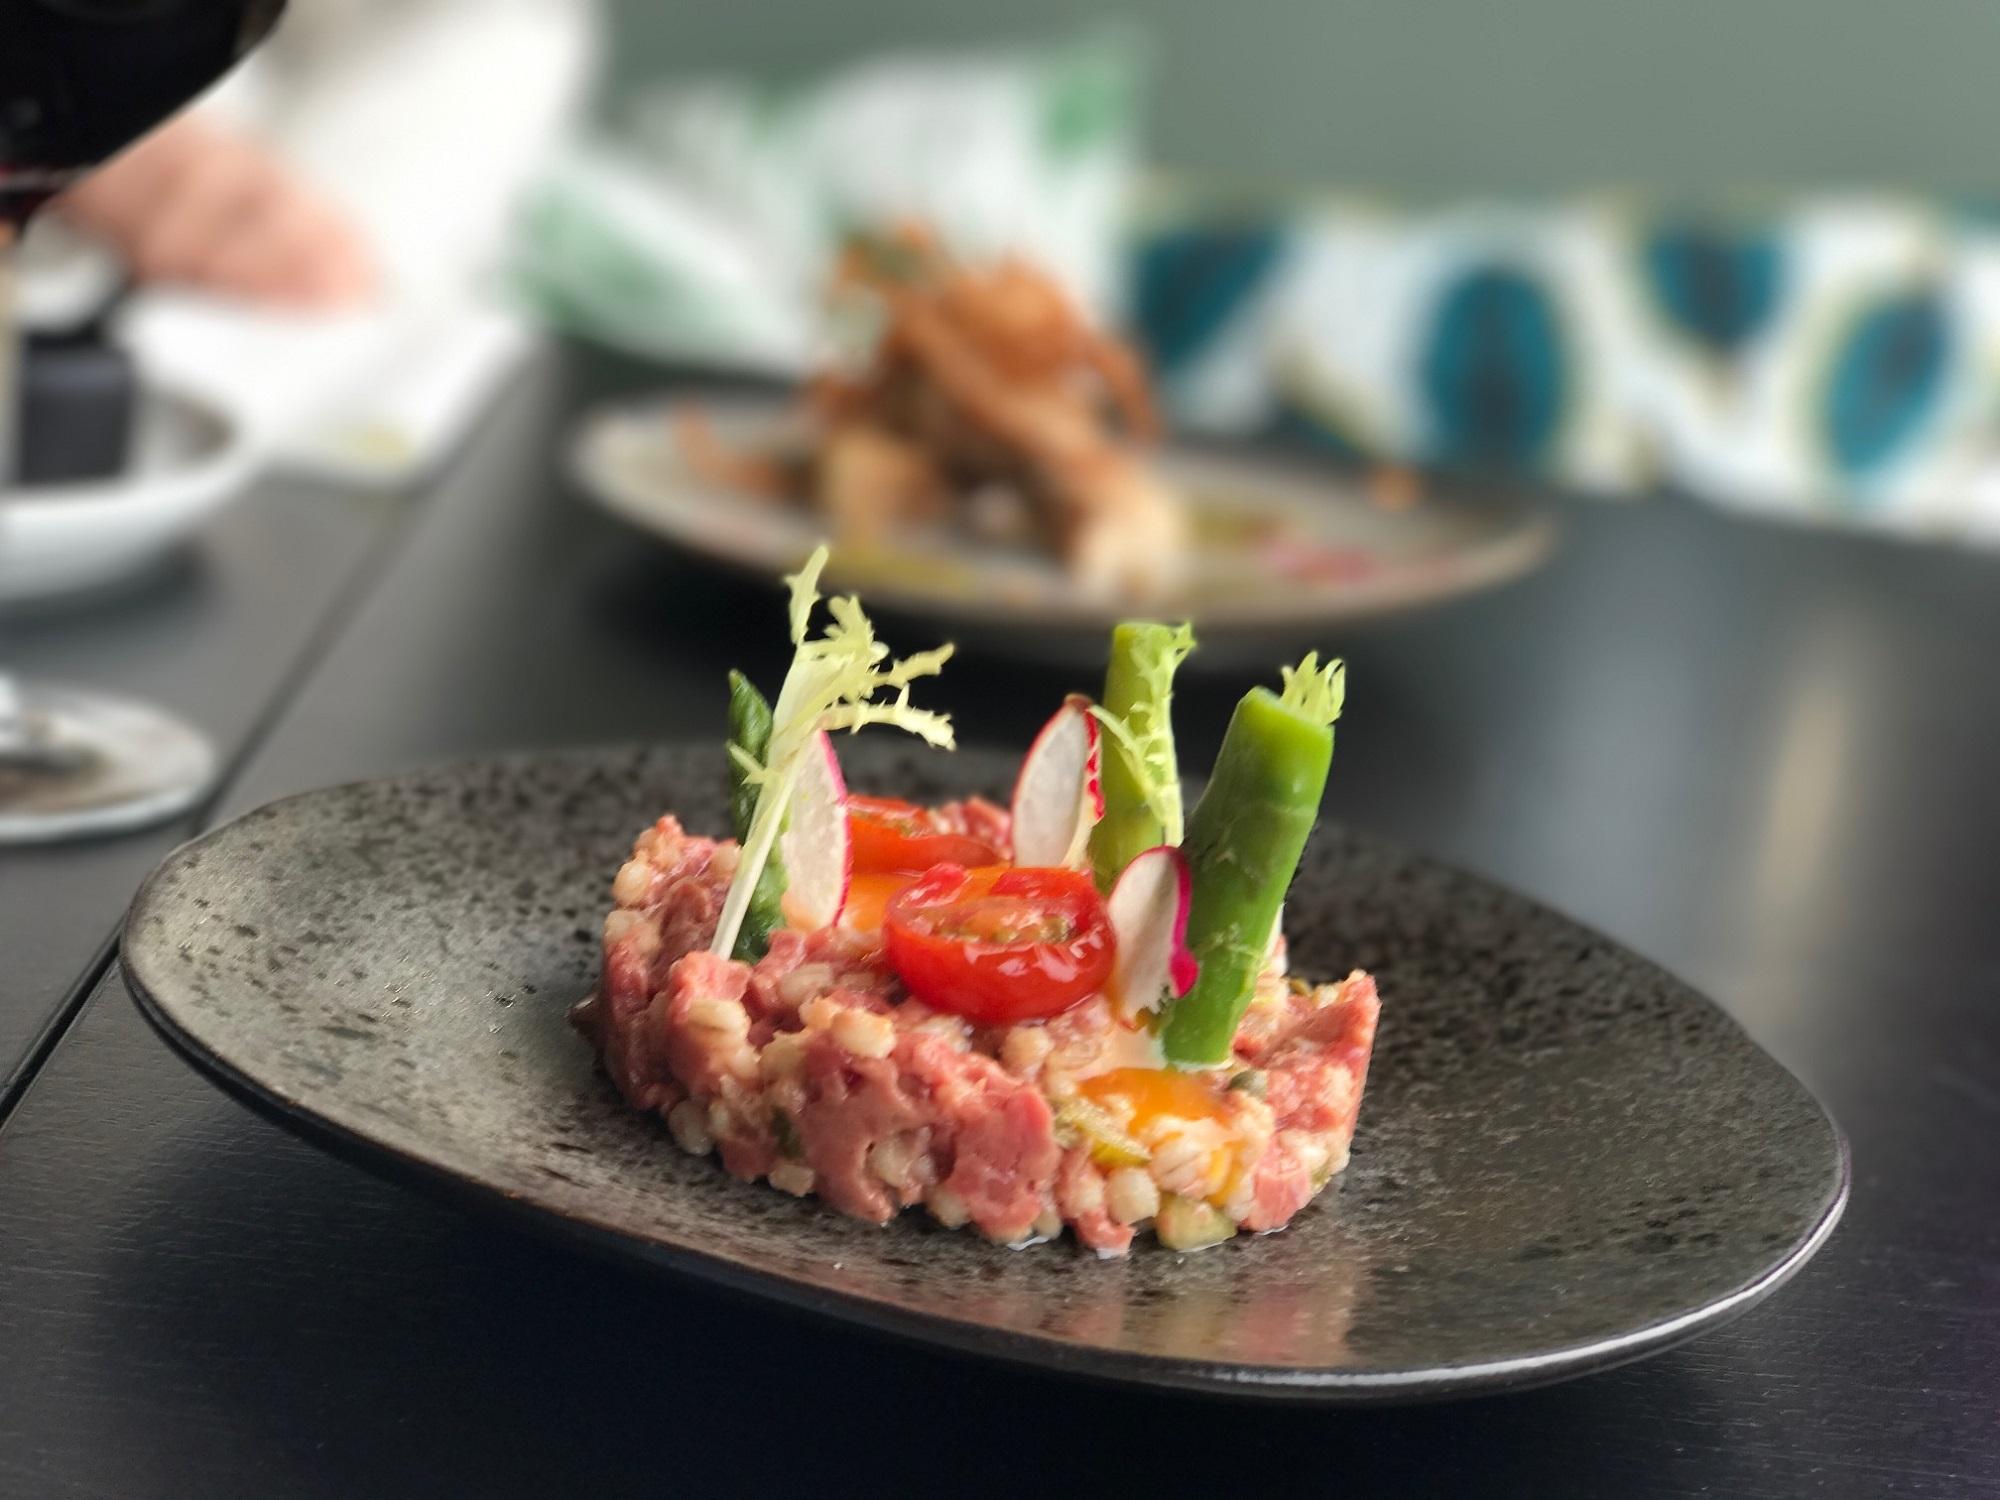 Atelier Bar en Restaurant in Amsterdam